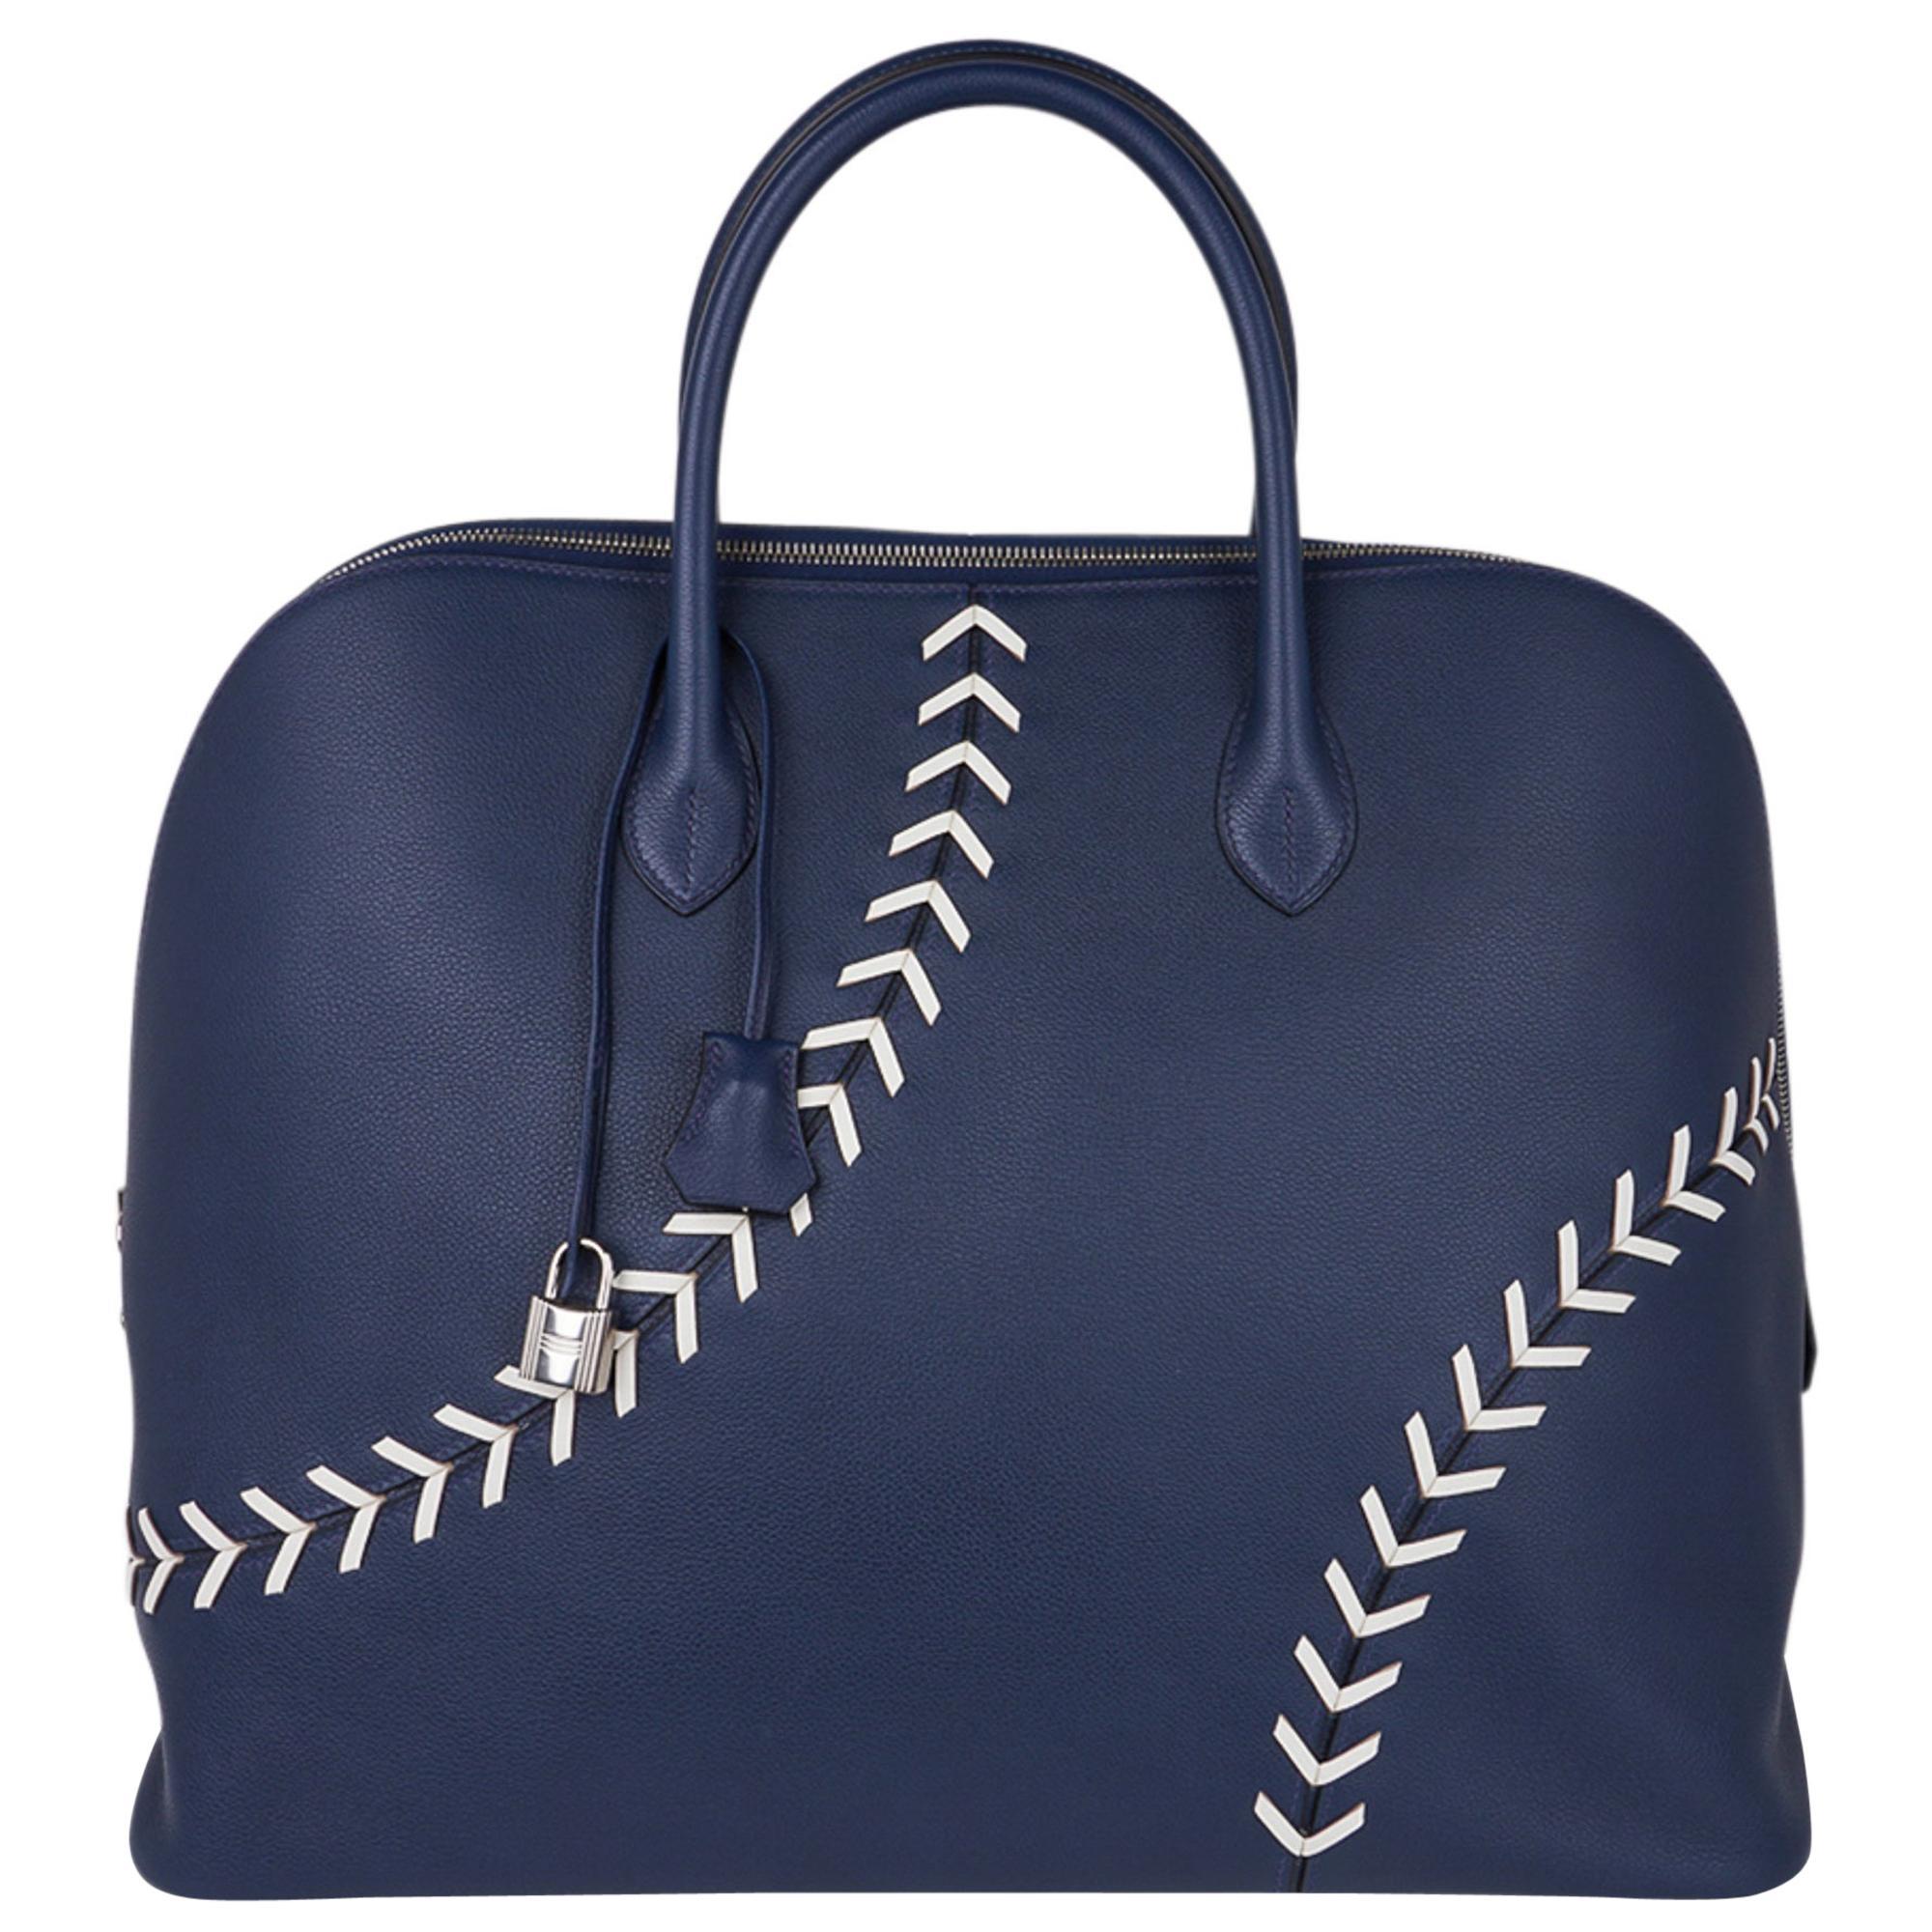 Hermes Bolide 1923 Baseball 45 Bag Bleu de Malte Limited Edition Weekender New